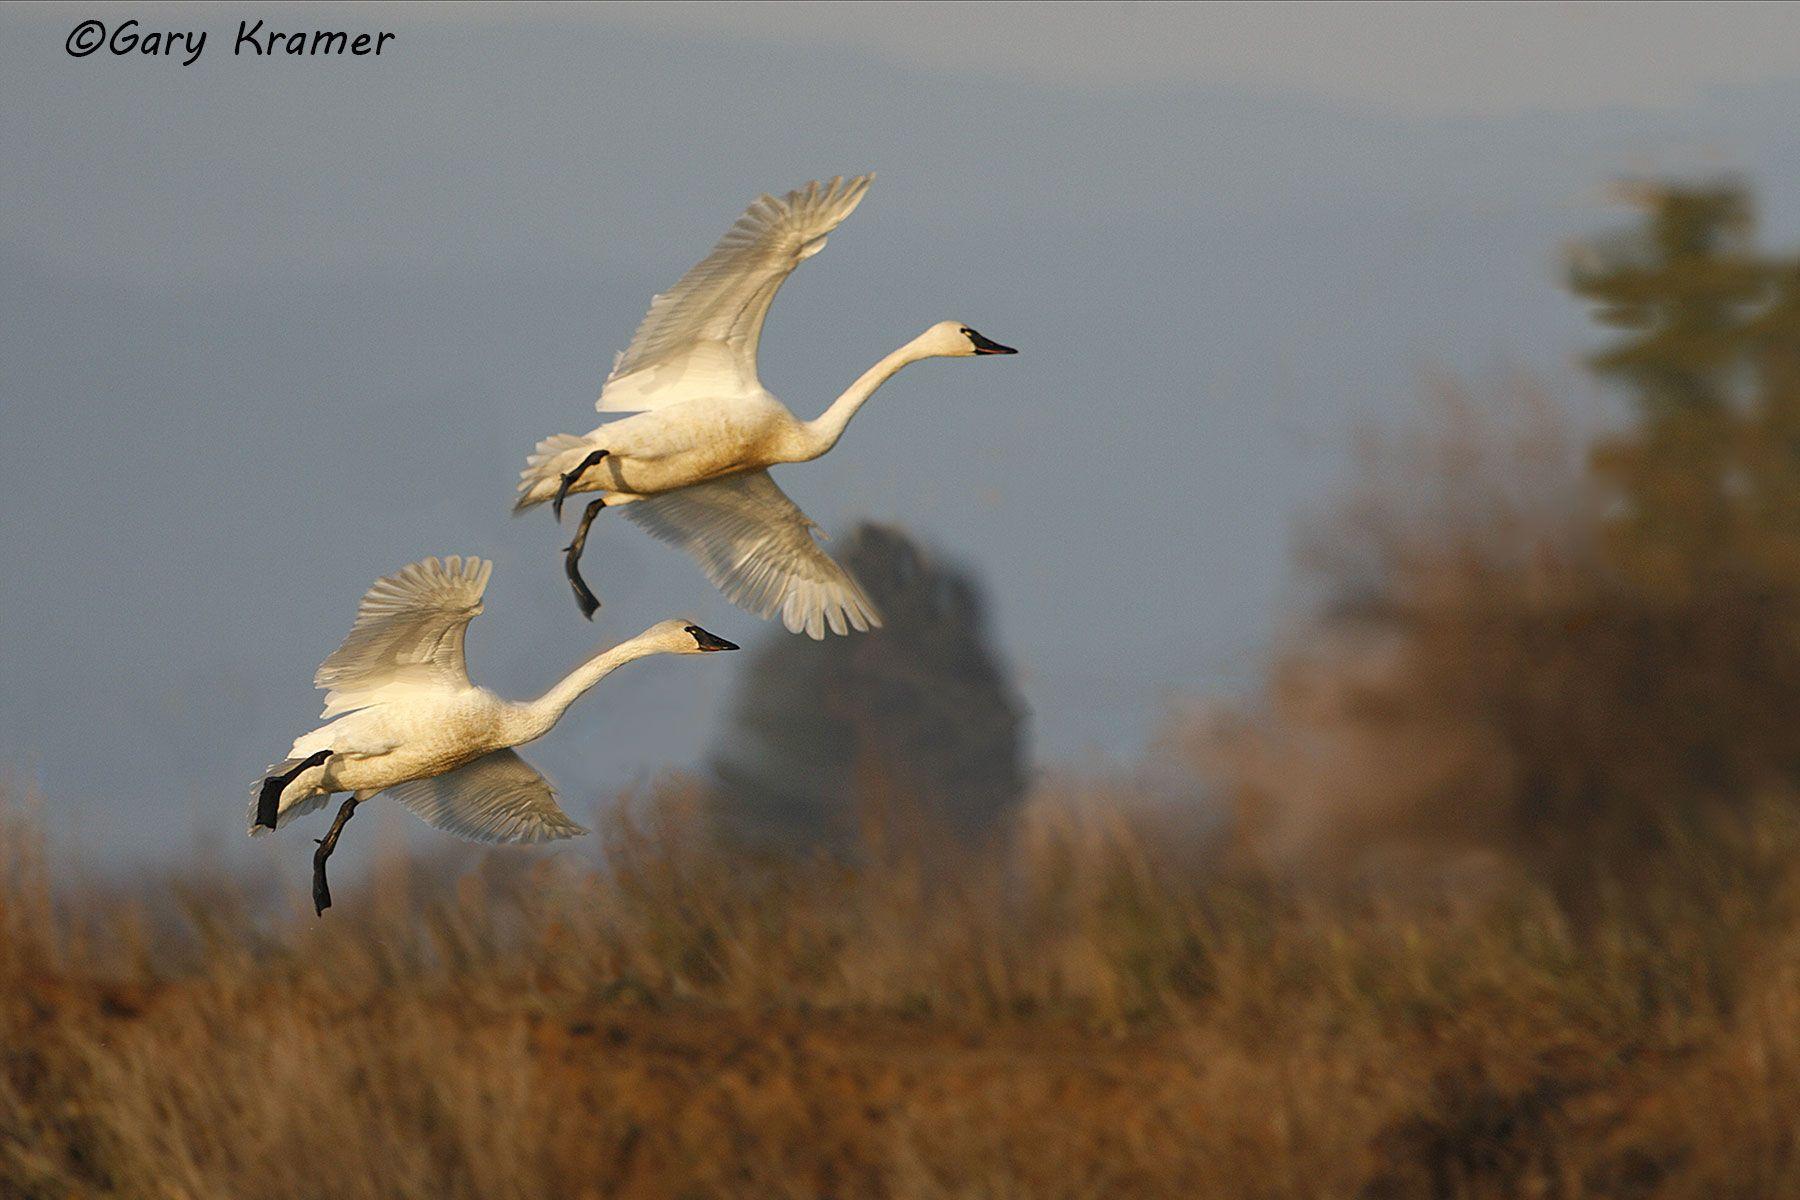 Tundra (Whistling) Swan (Cygnus columbianus) - NBWT#182d